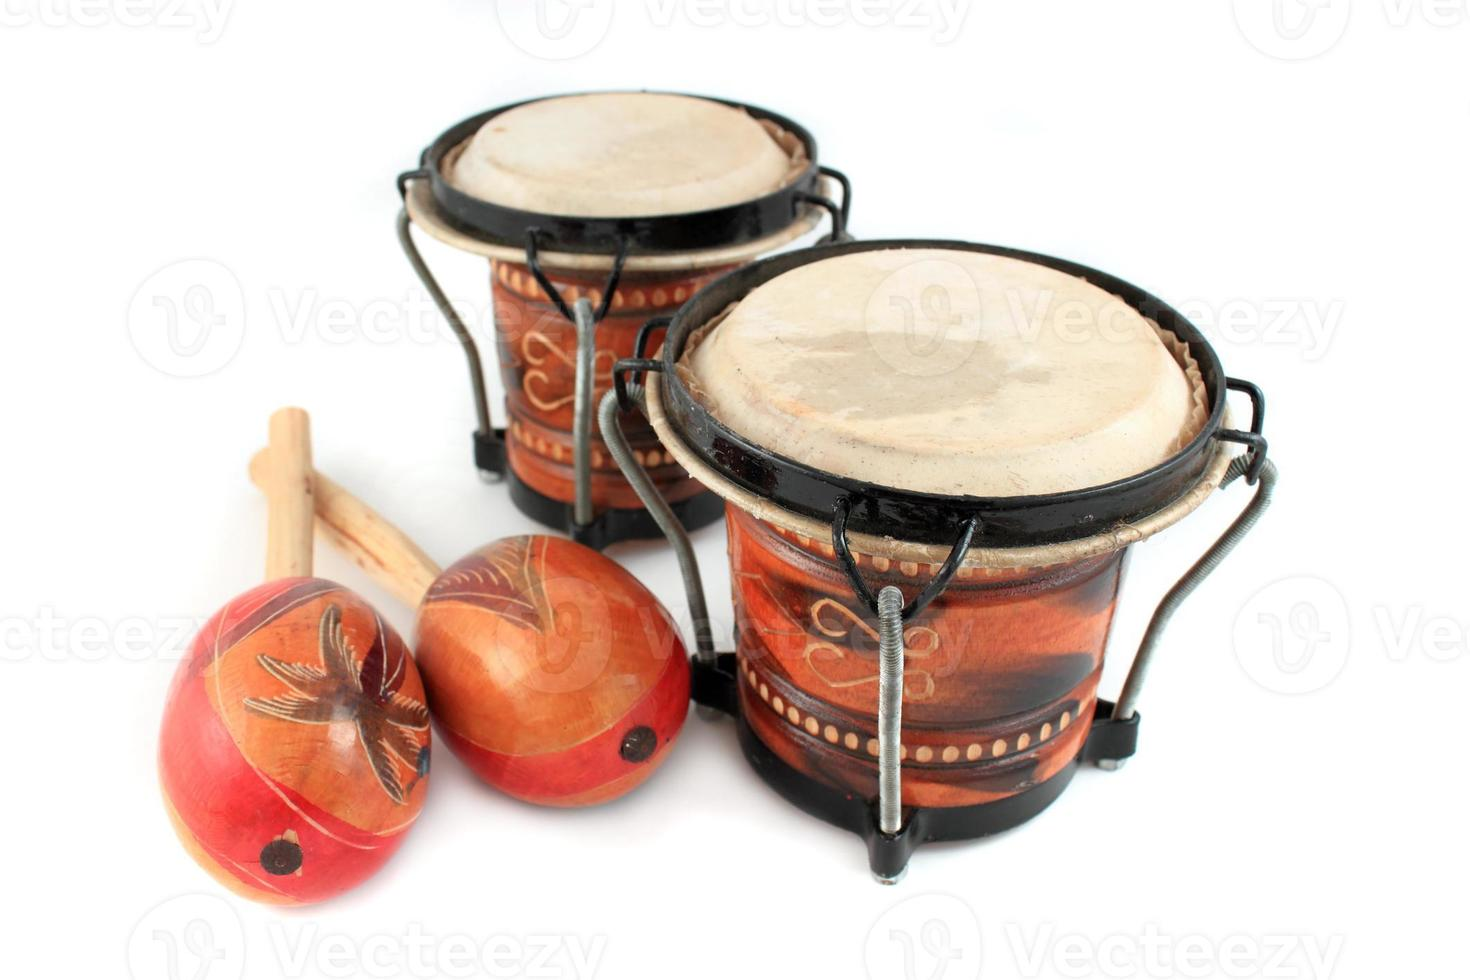 ritme-instrumenten foto